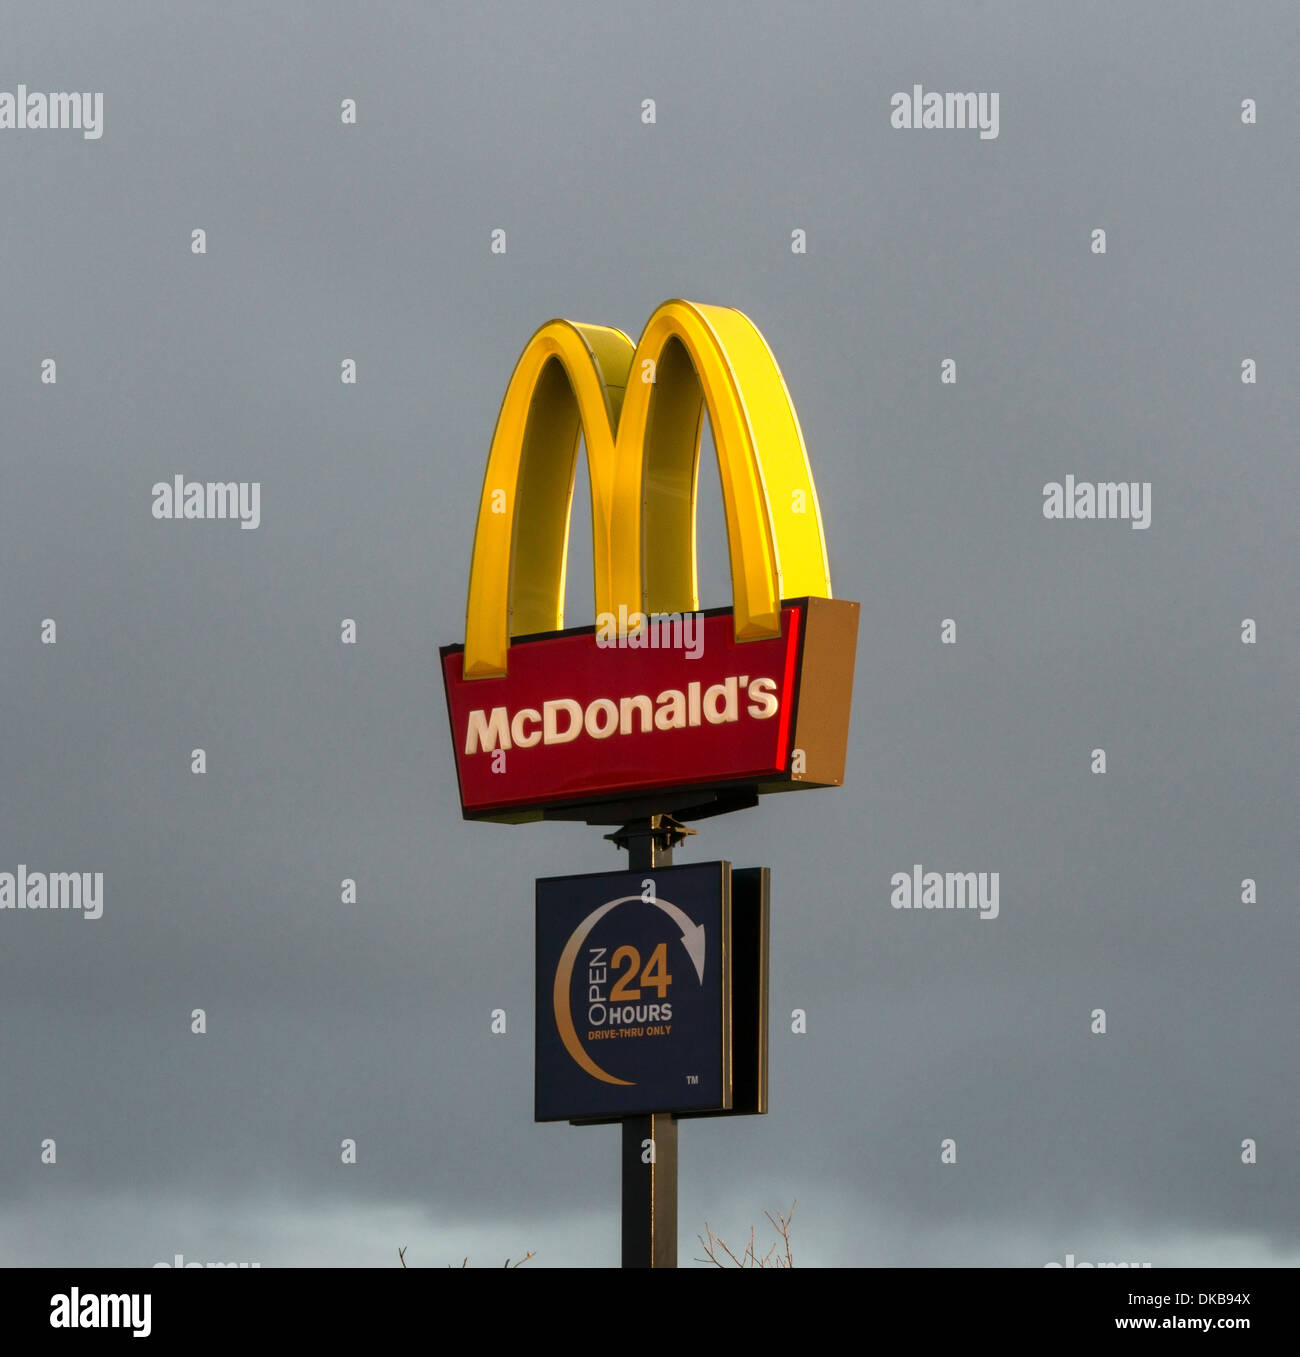 McDonald's Sign - Stock Image